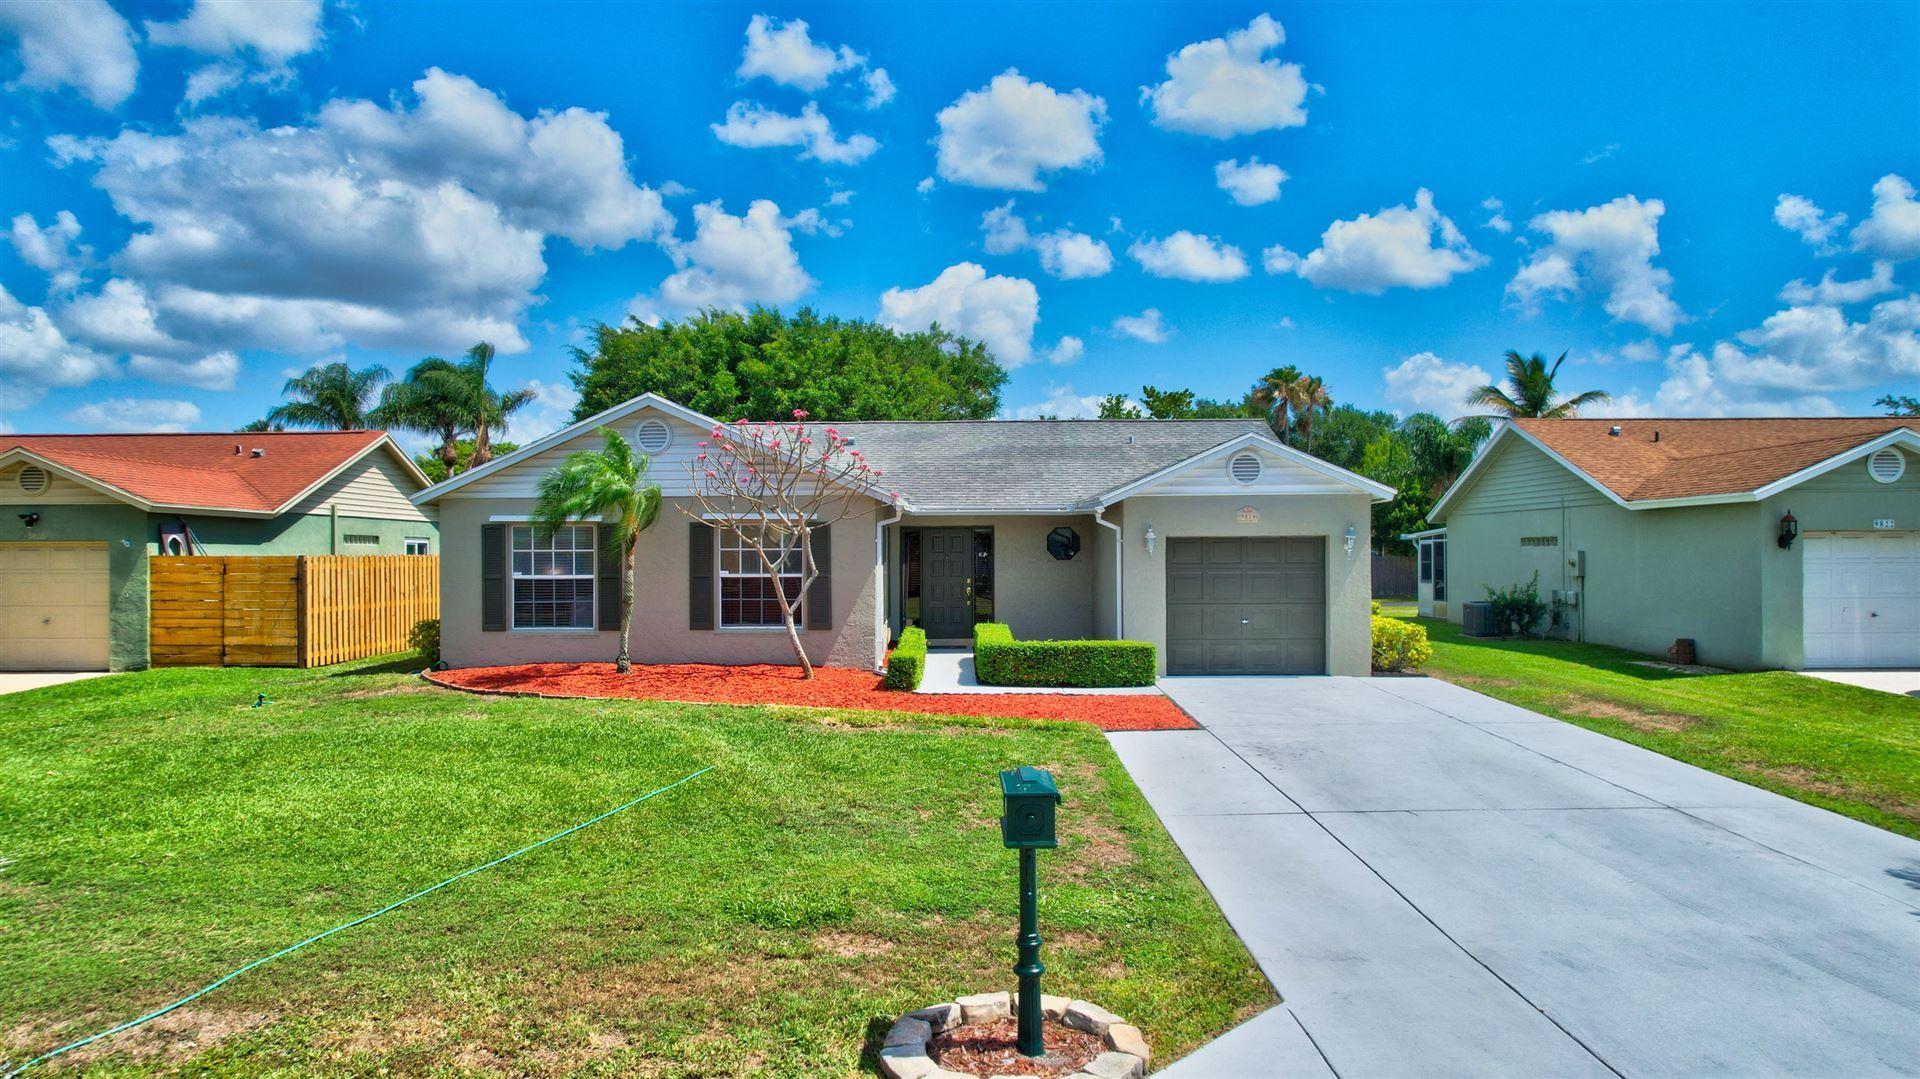 9814 Goldenrod Drive, Boynton Beach, FL 33437 - MLS#: RX-10720187